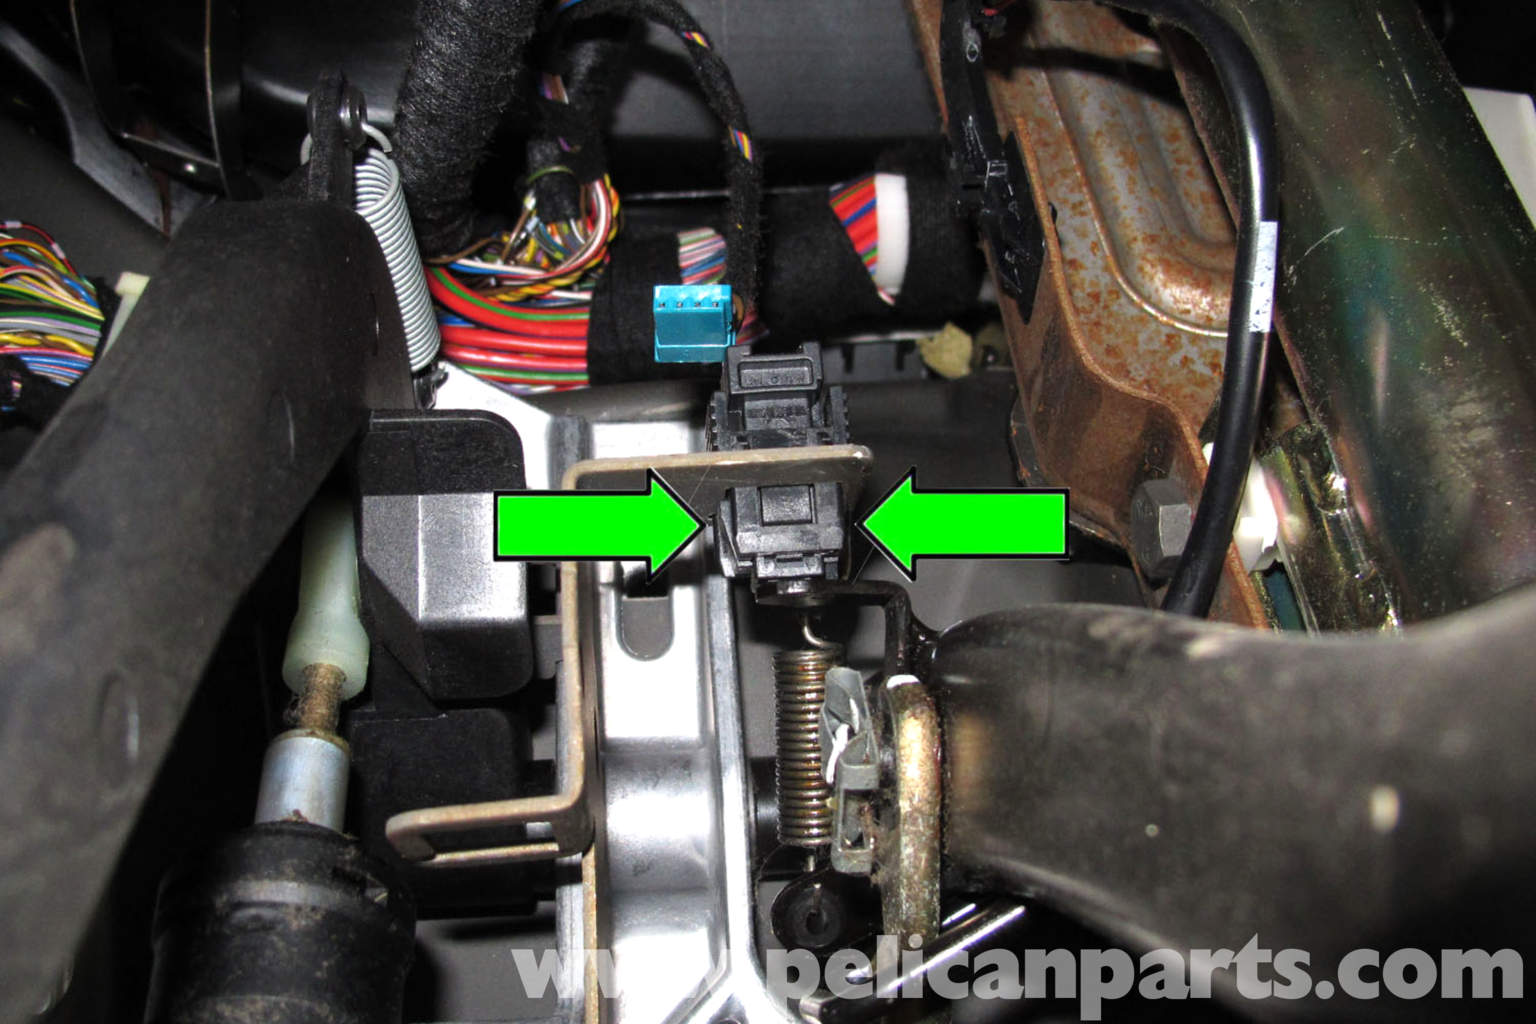 2003 Saturn L200 Radio Wiring Diagram Bmw E46 Brake Light Switch Replacement Bmw 325i 2001